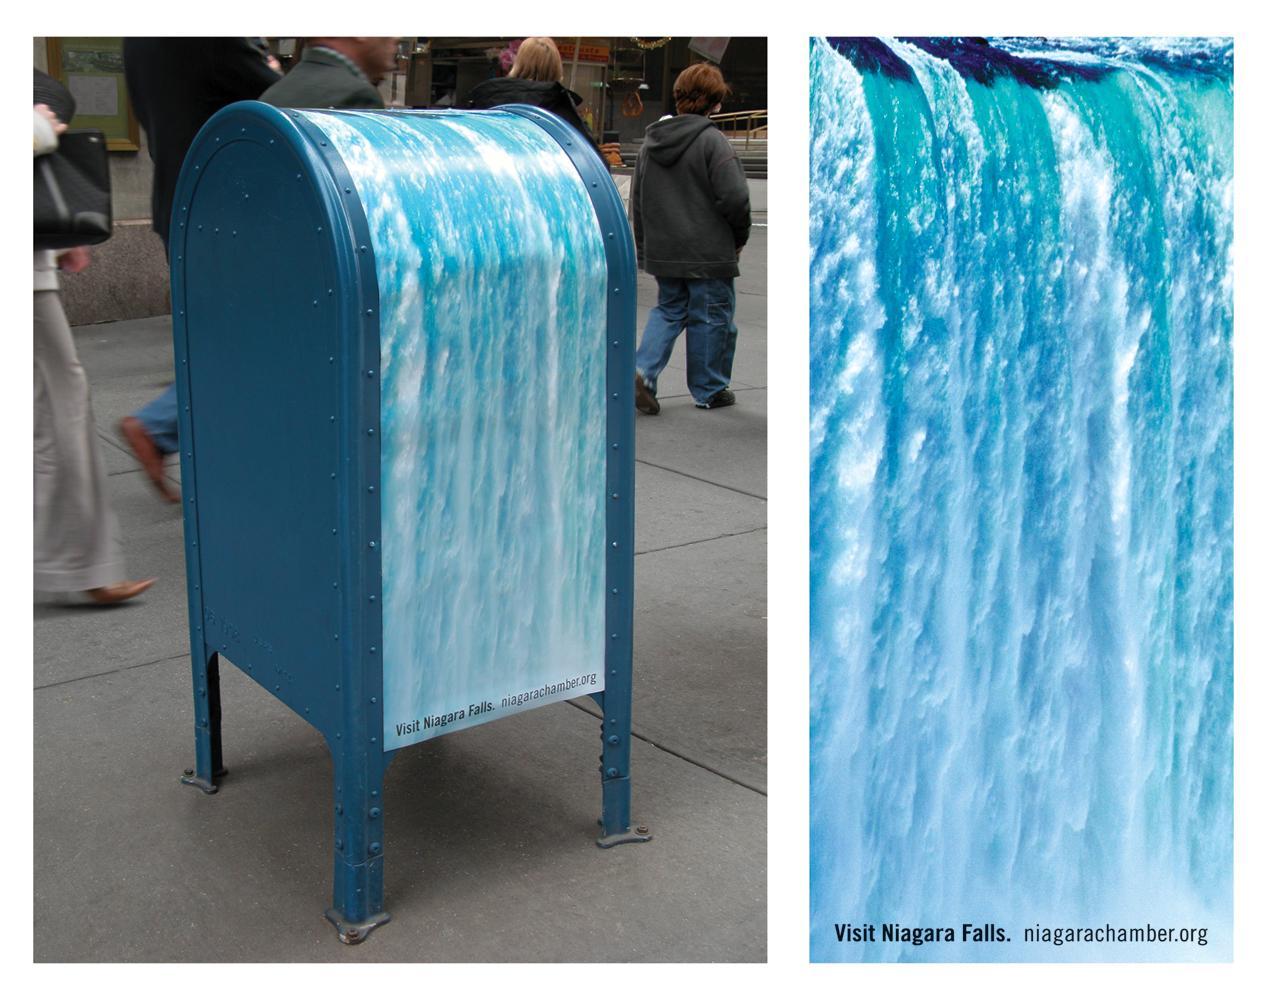 Post-box waterfall